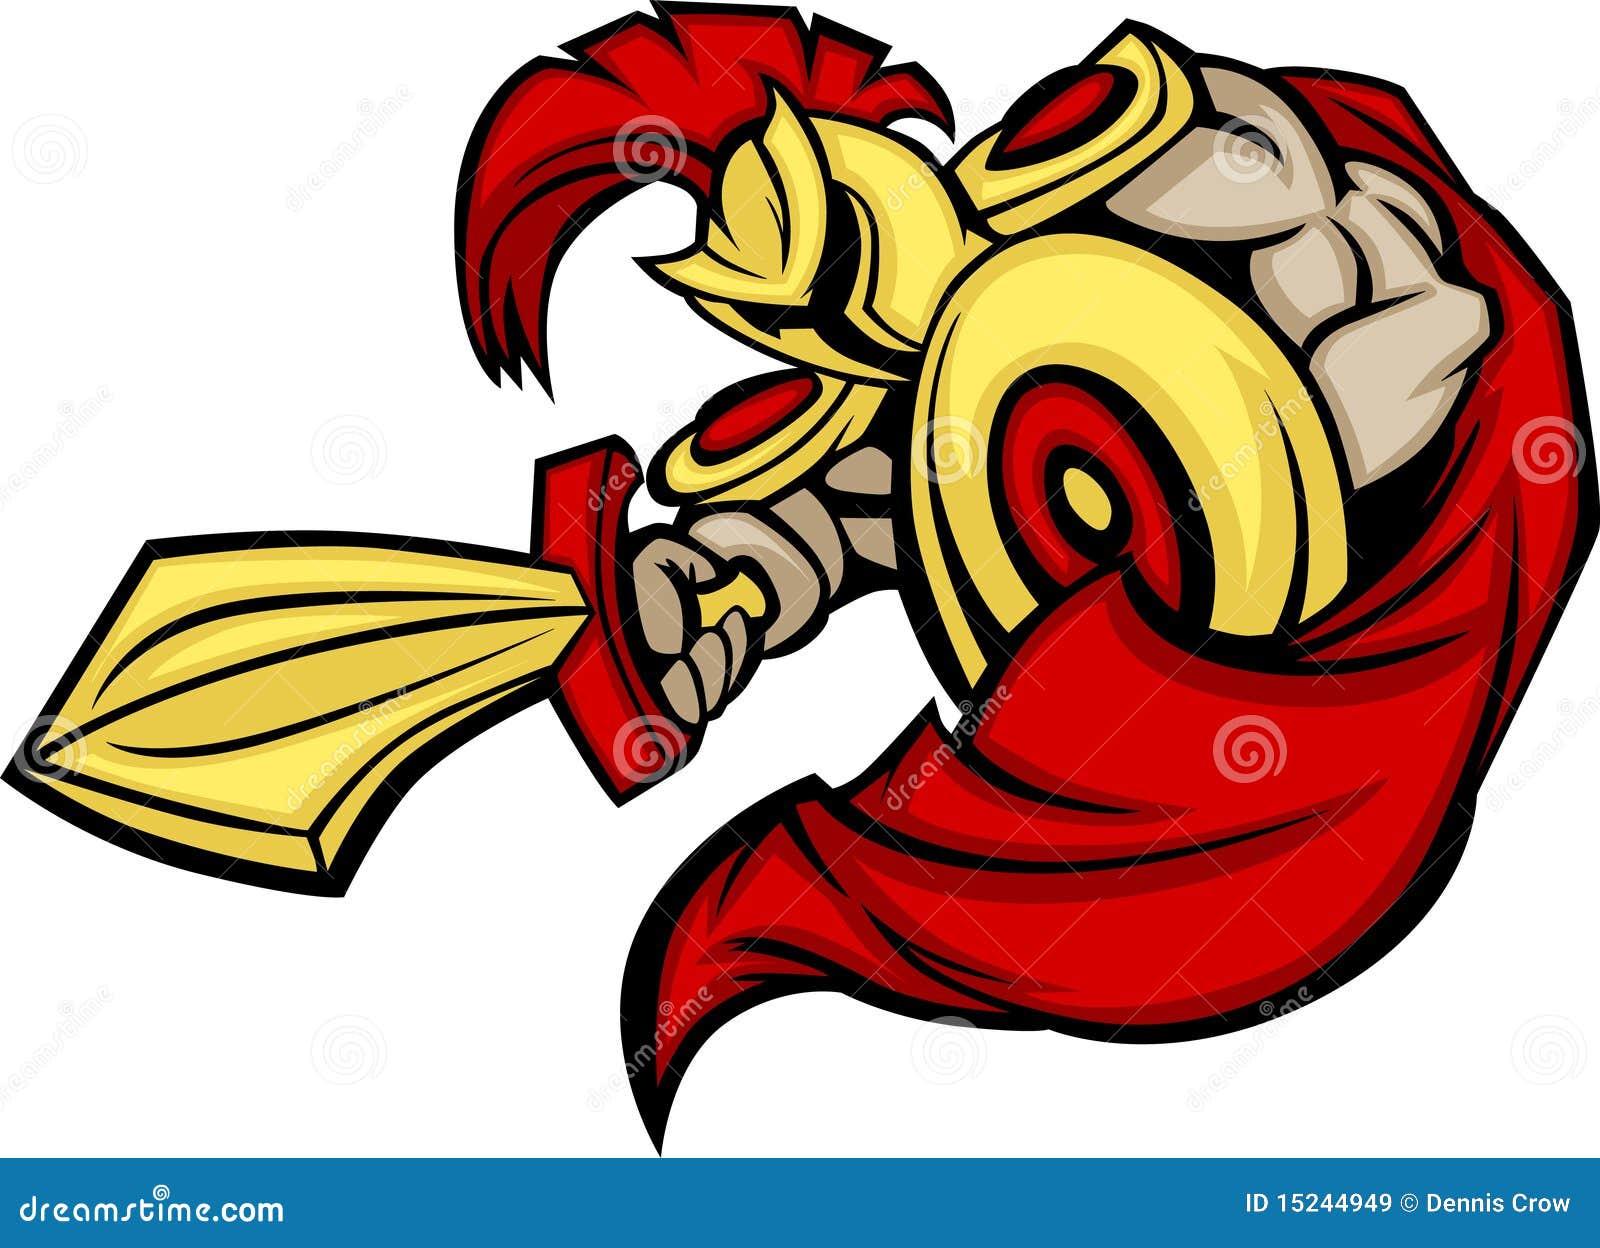 Spartan / Trojan Mascot Logo Royalty Free Stock Images ...